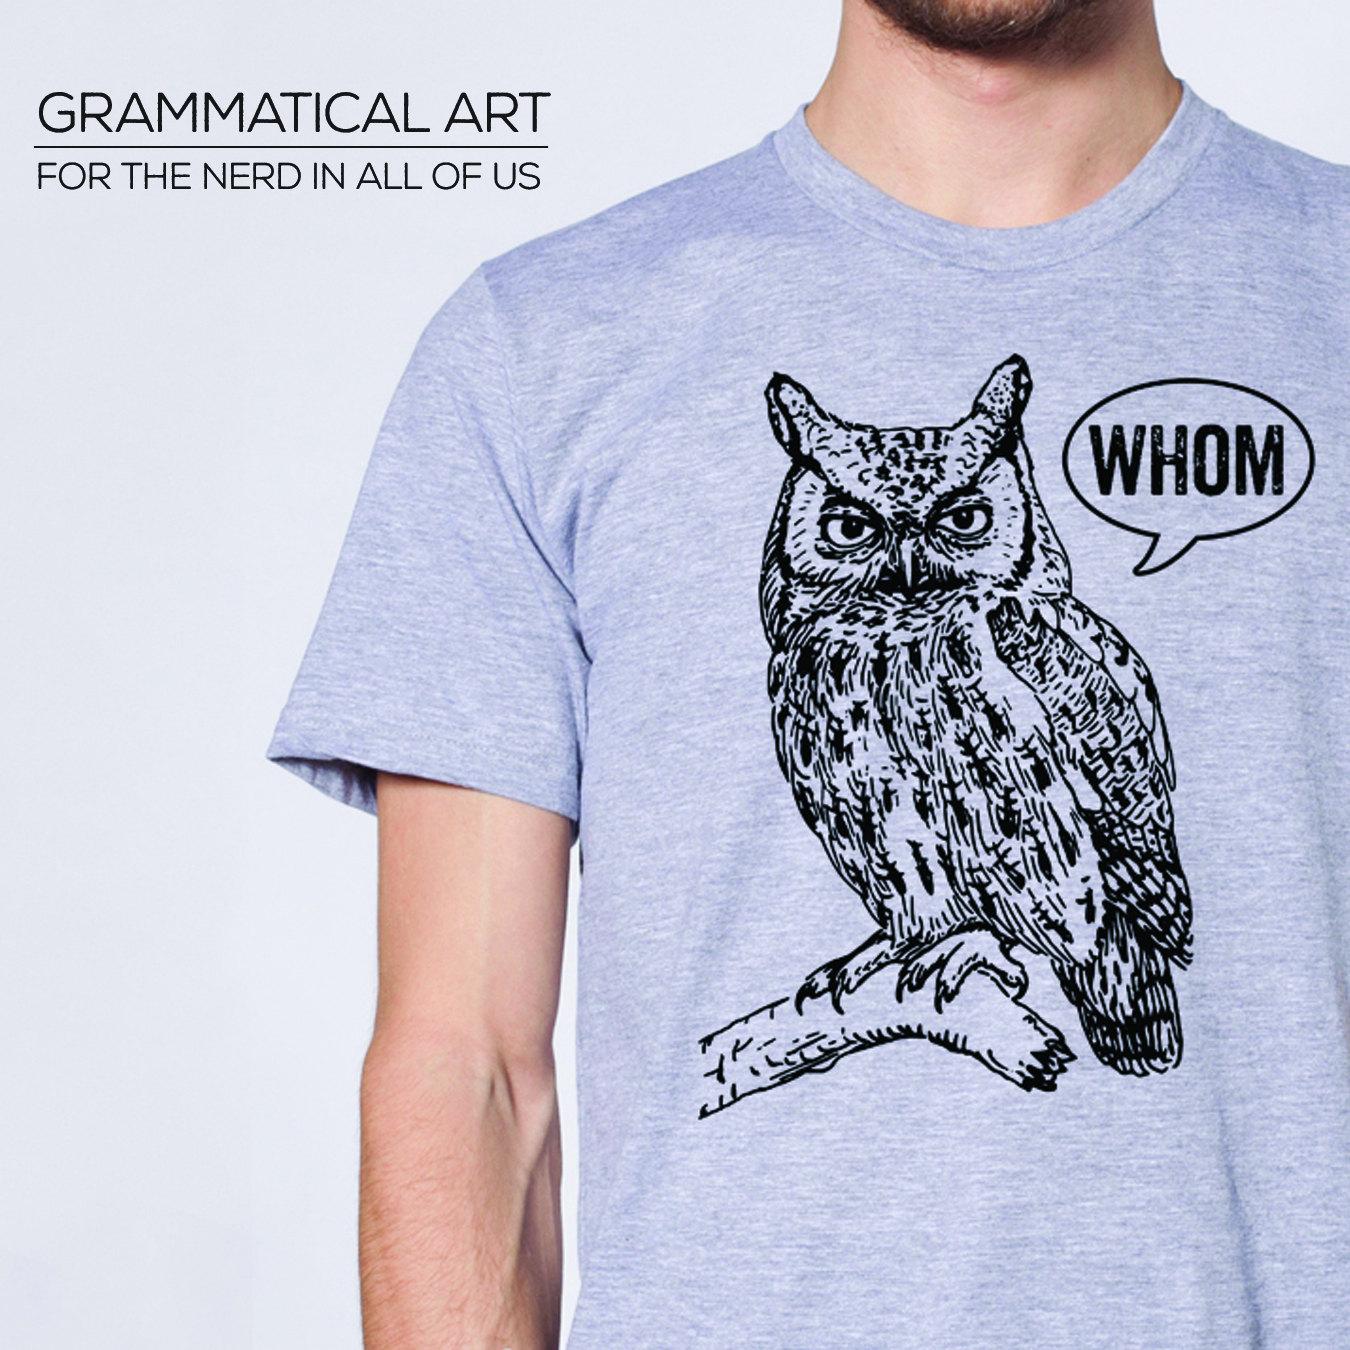 GrammaticalArt